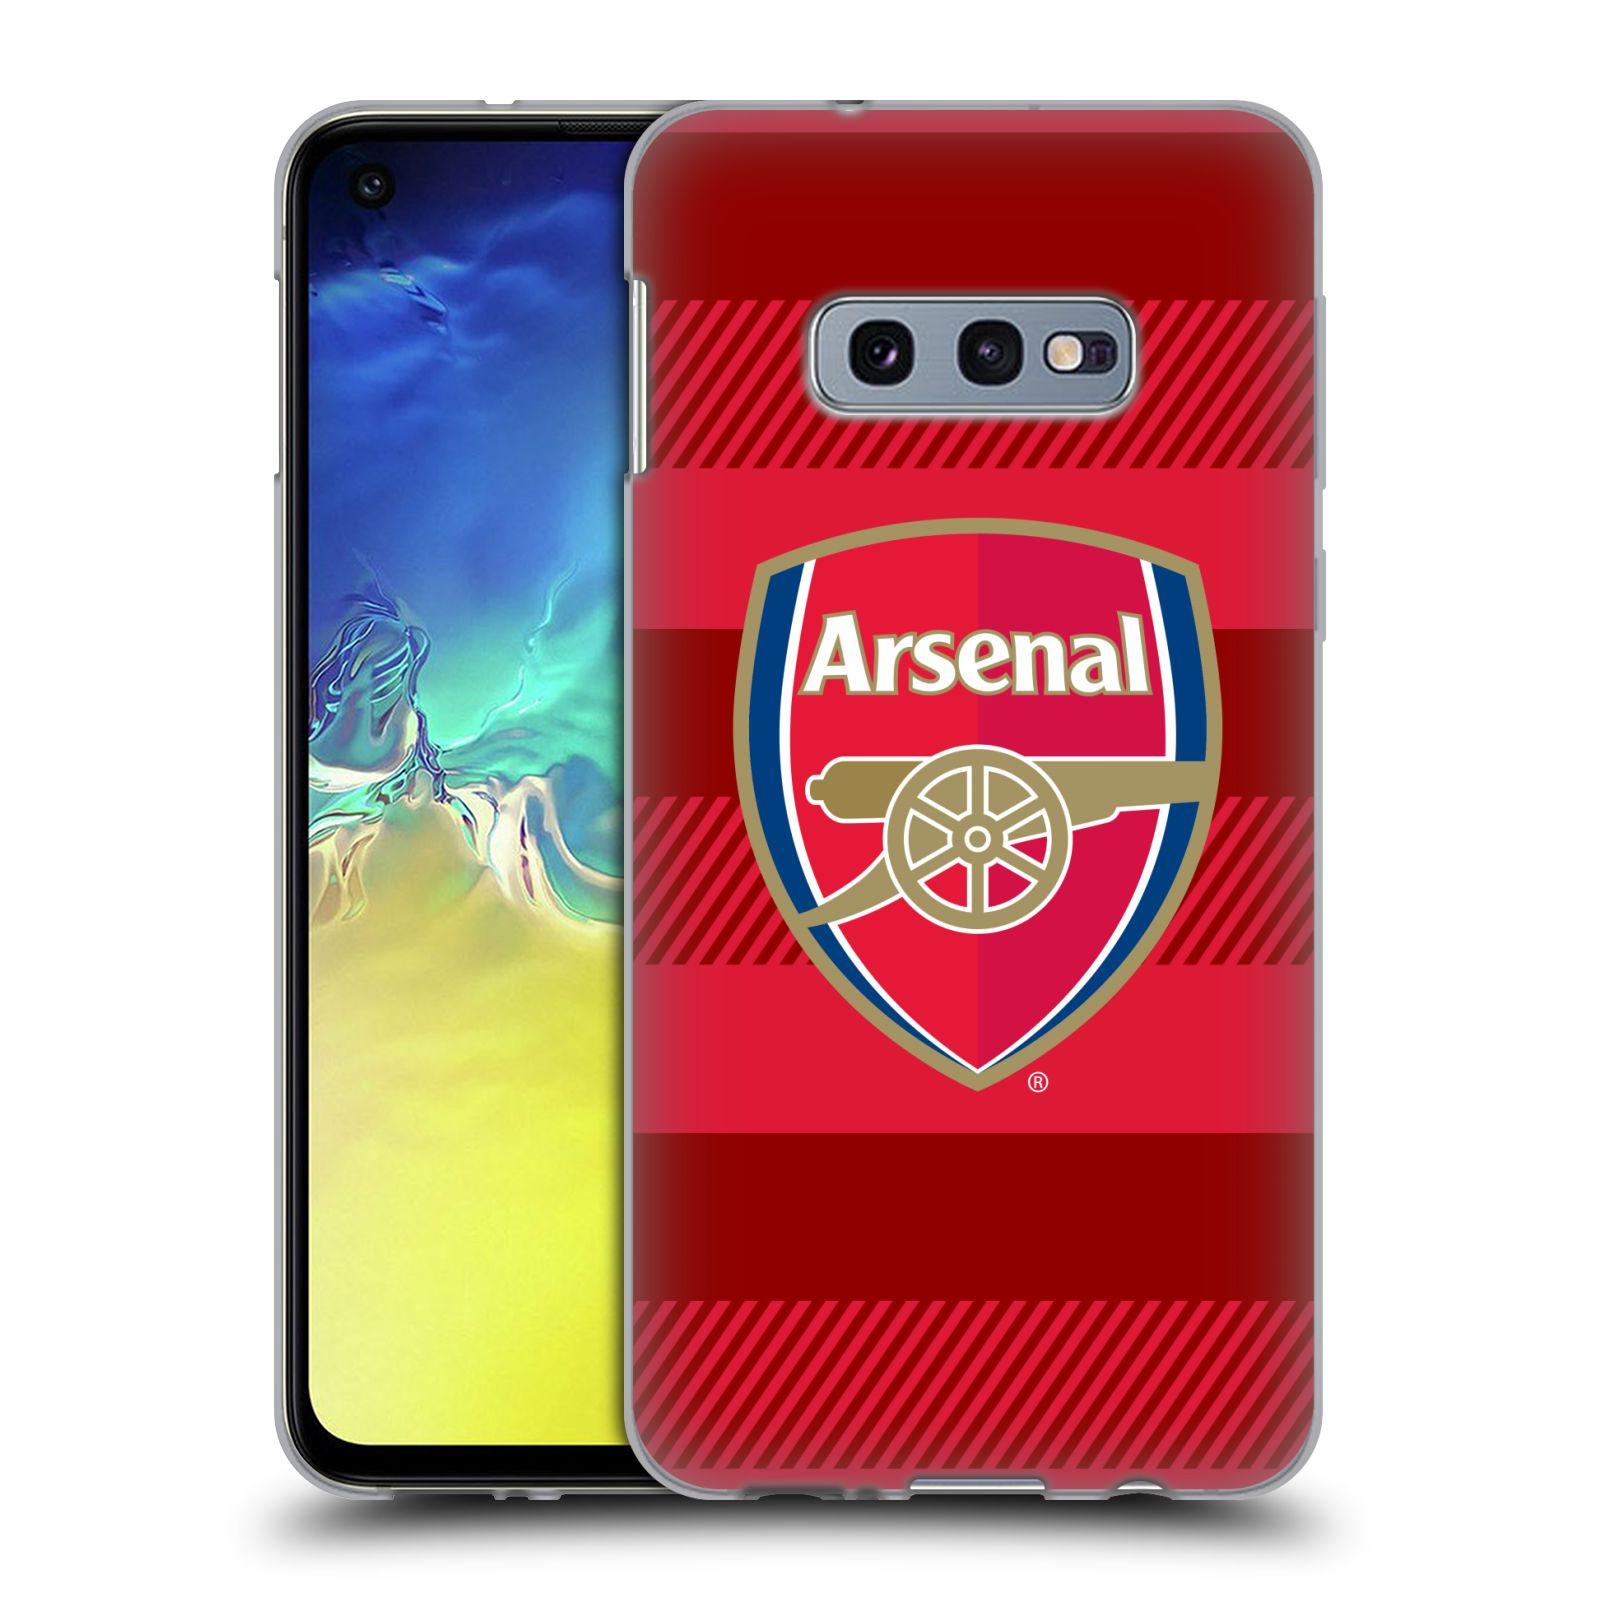 Silikonové pouzdro na mobil Samsung Galaxy S10e - Head Case - Arsenal FC - Logo s pruhy